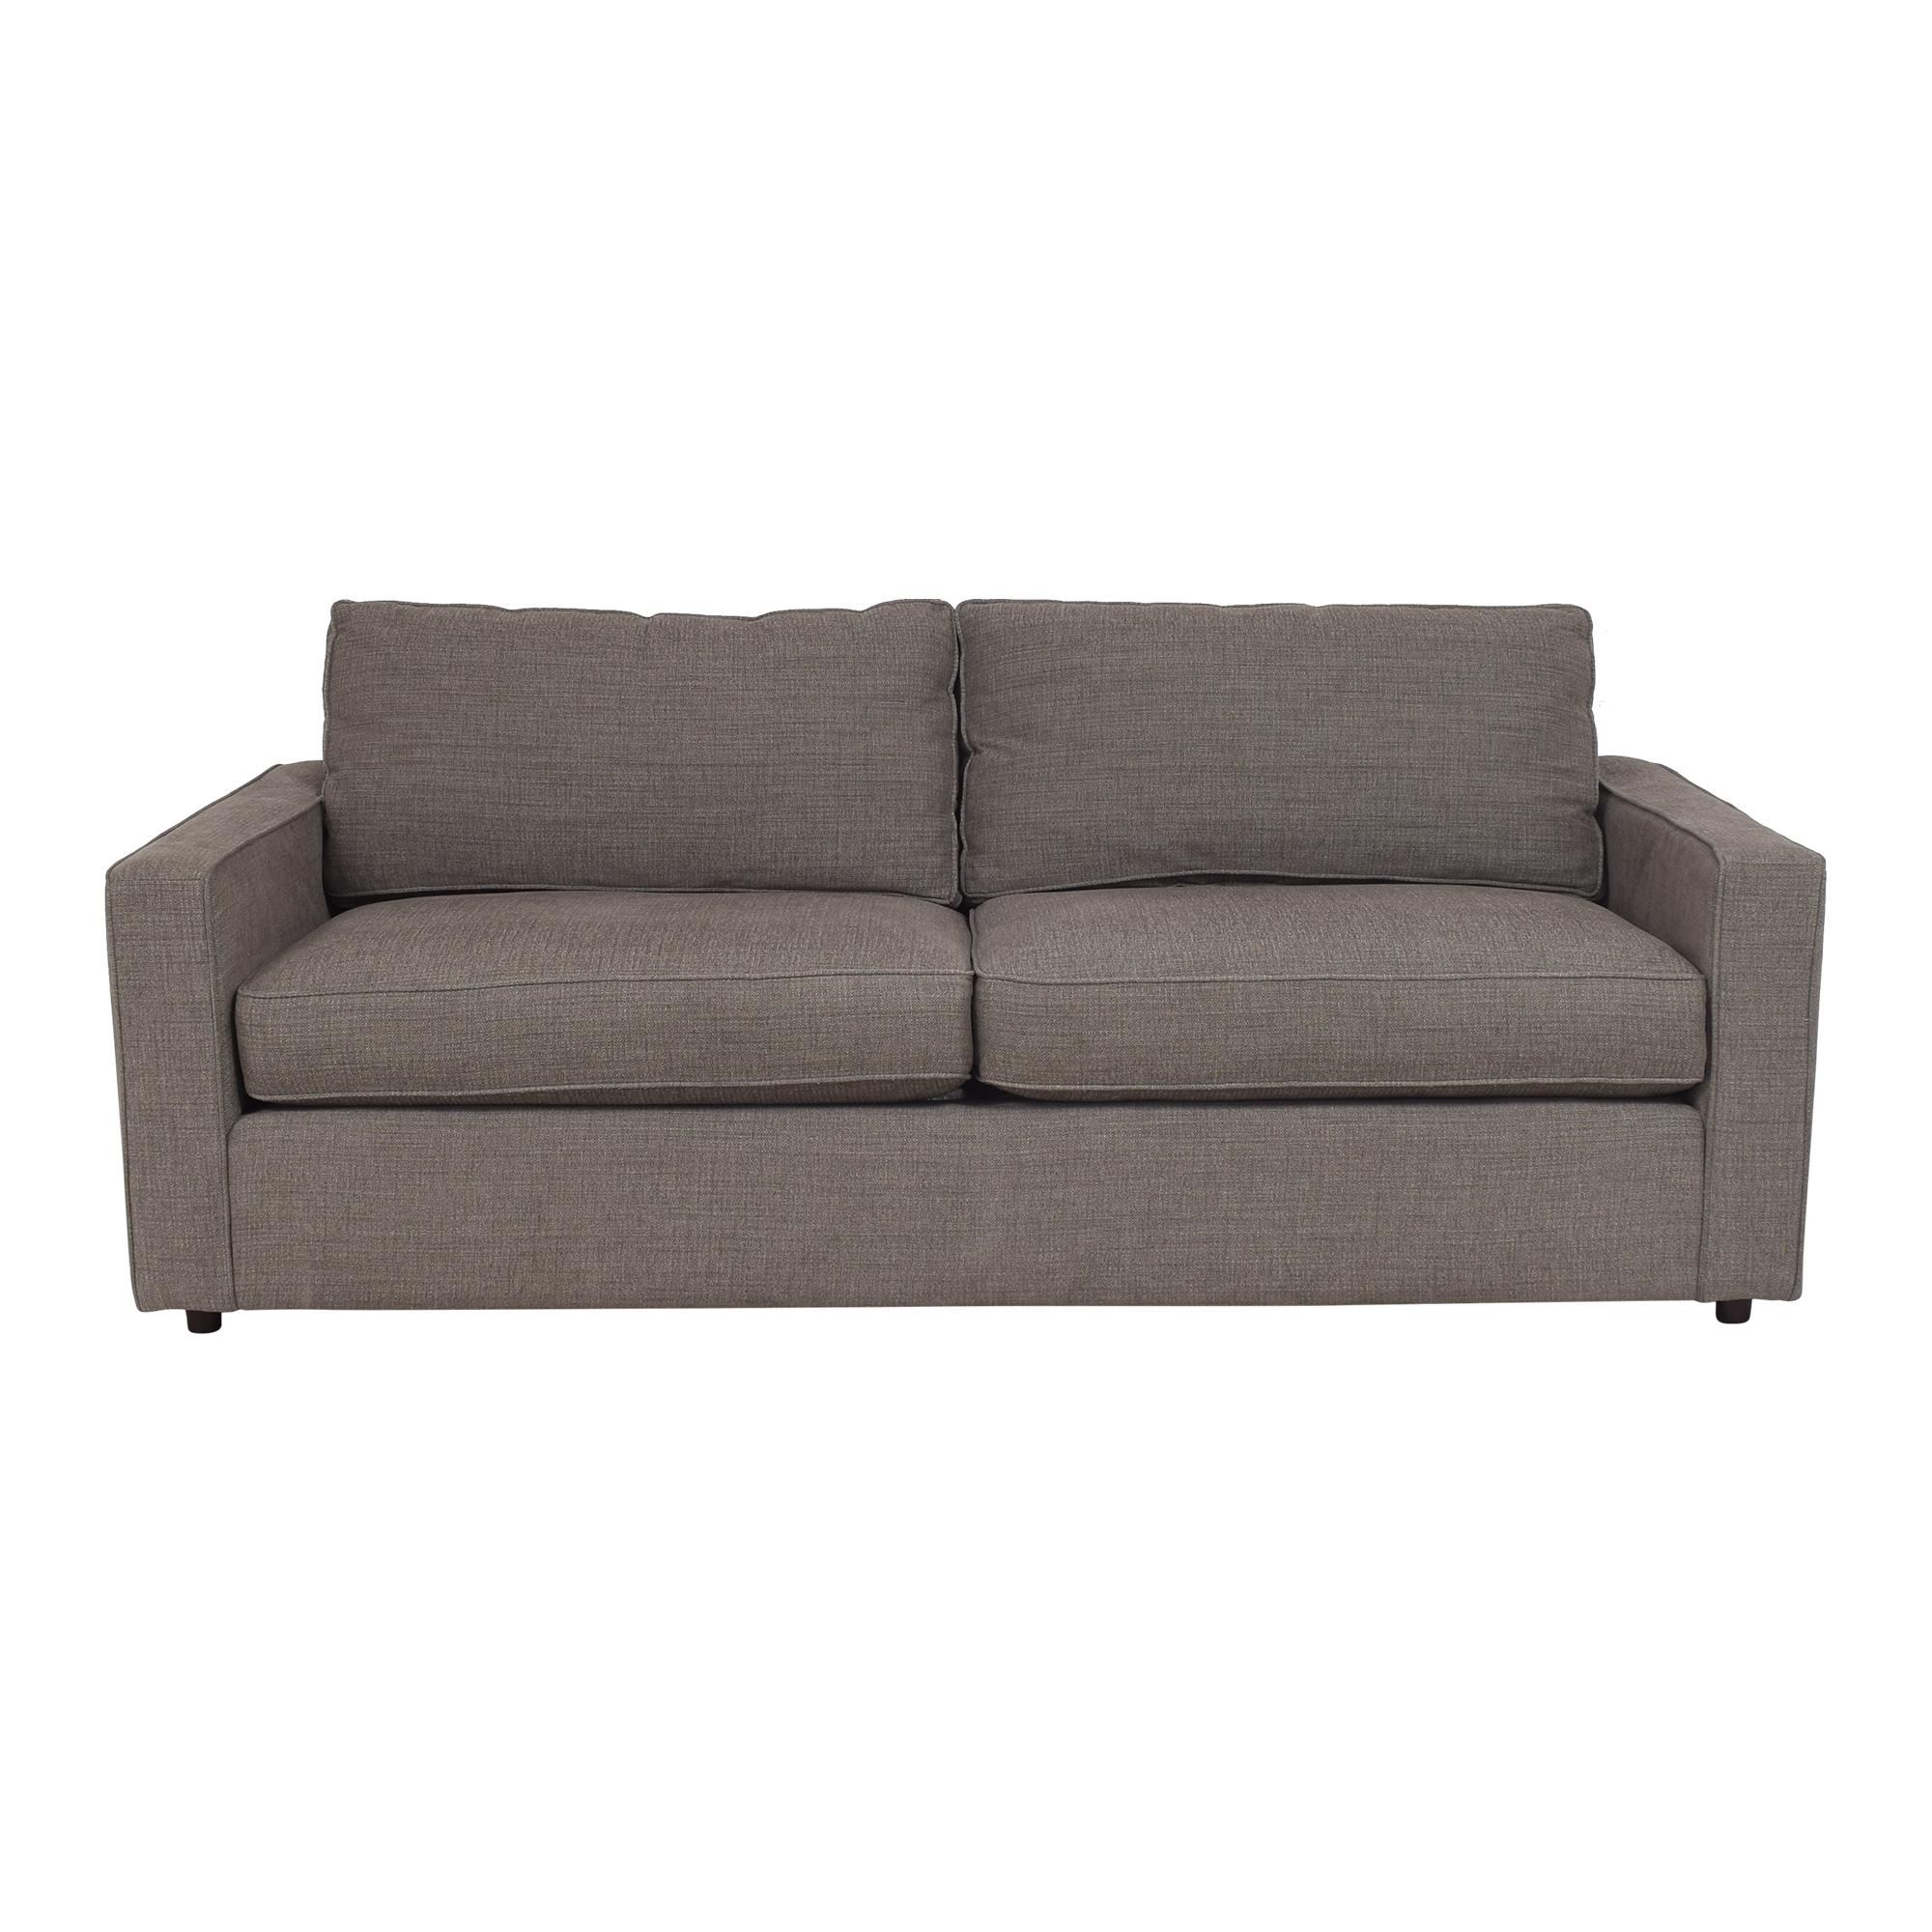 Room & Board Room & Board York Two Cushion Sofa on sale